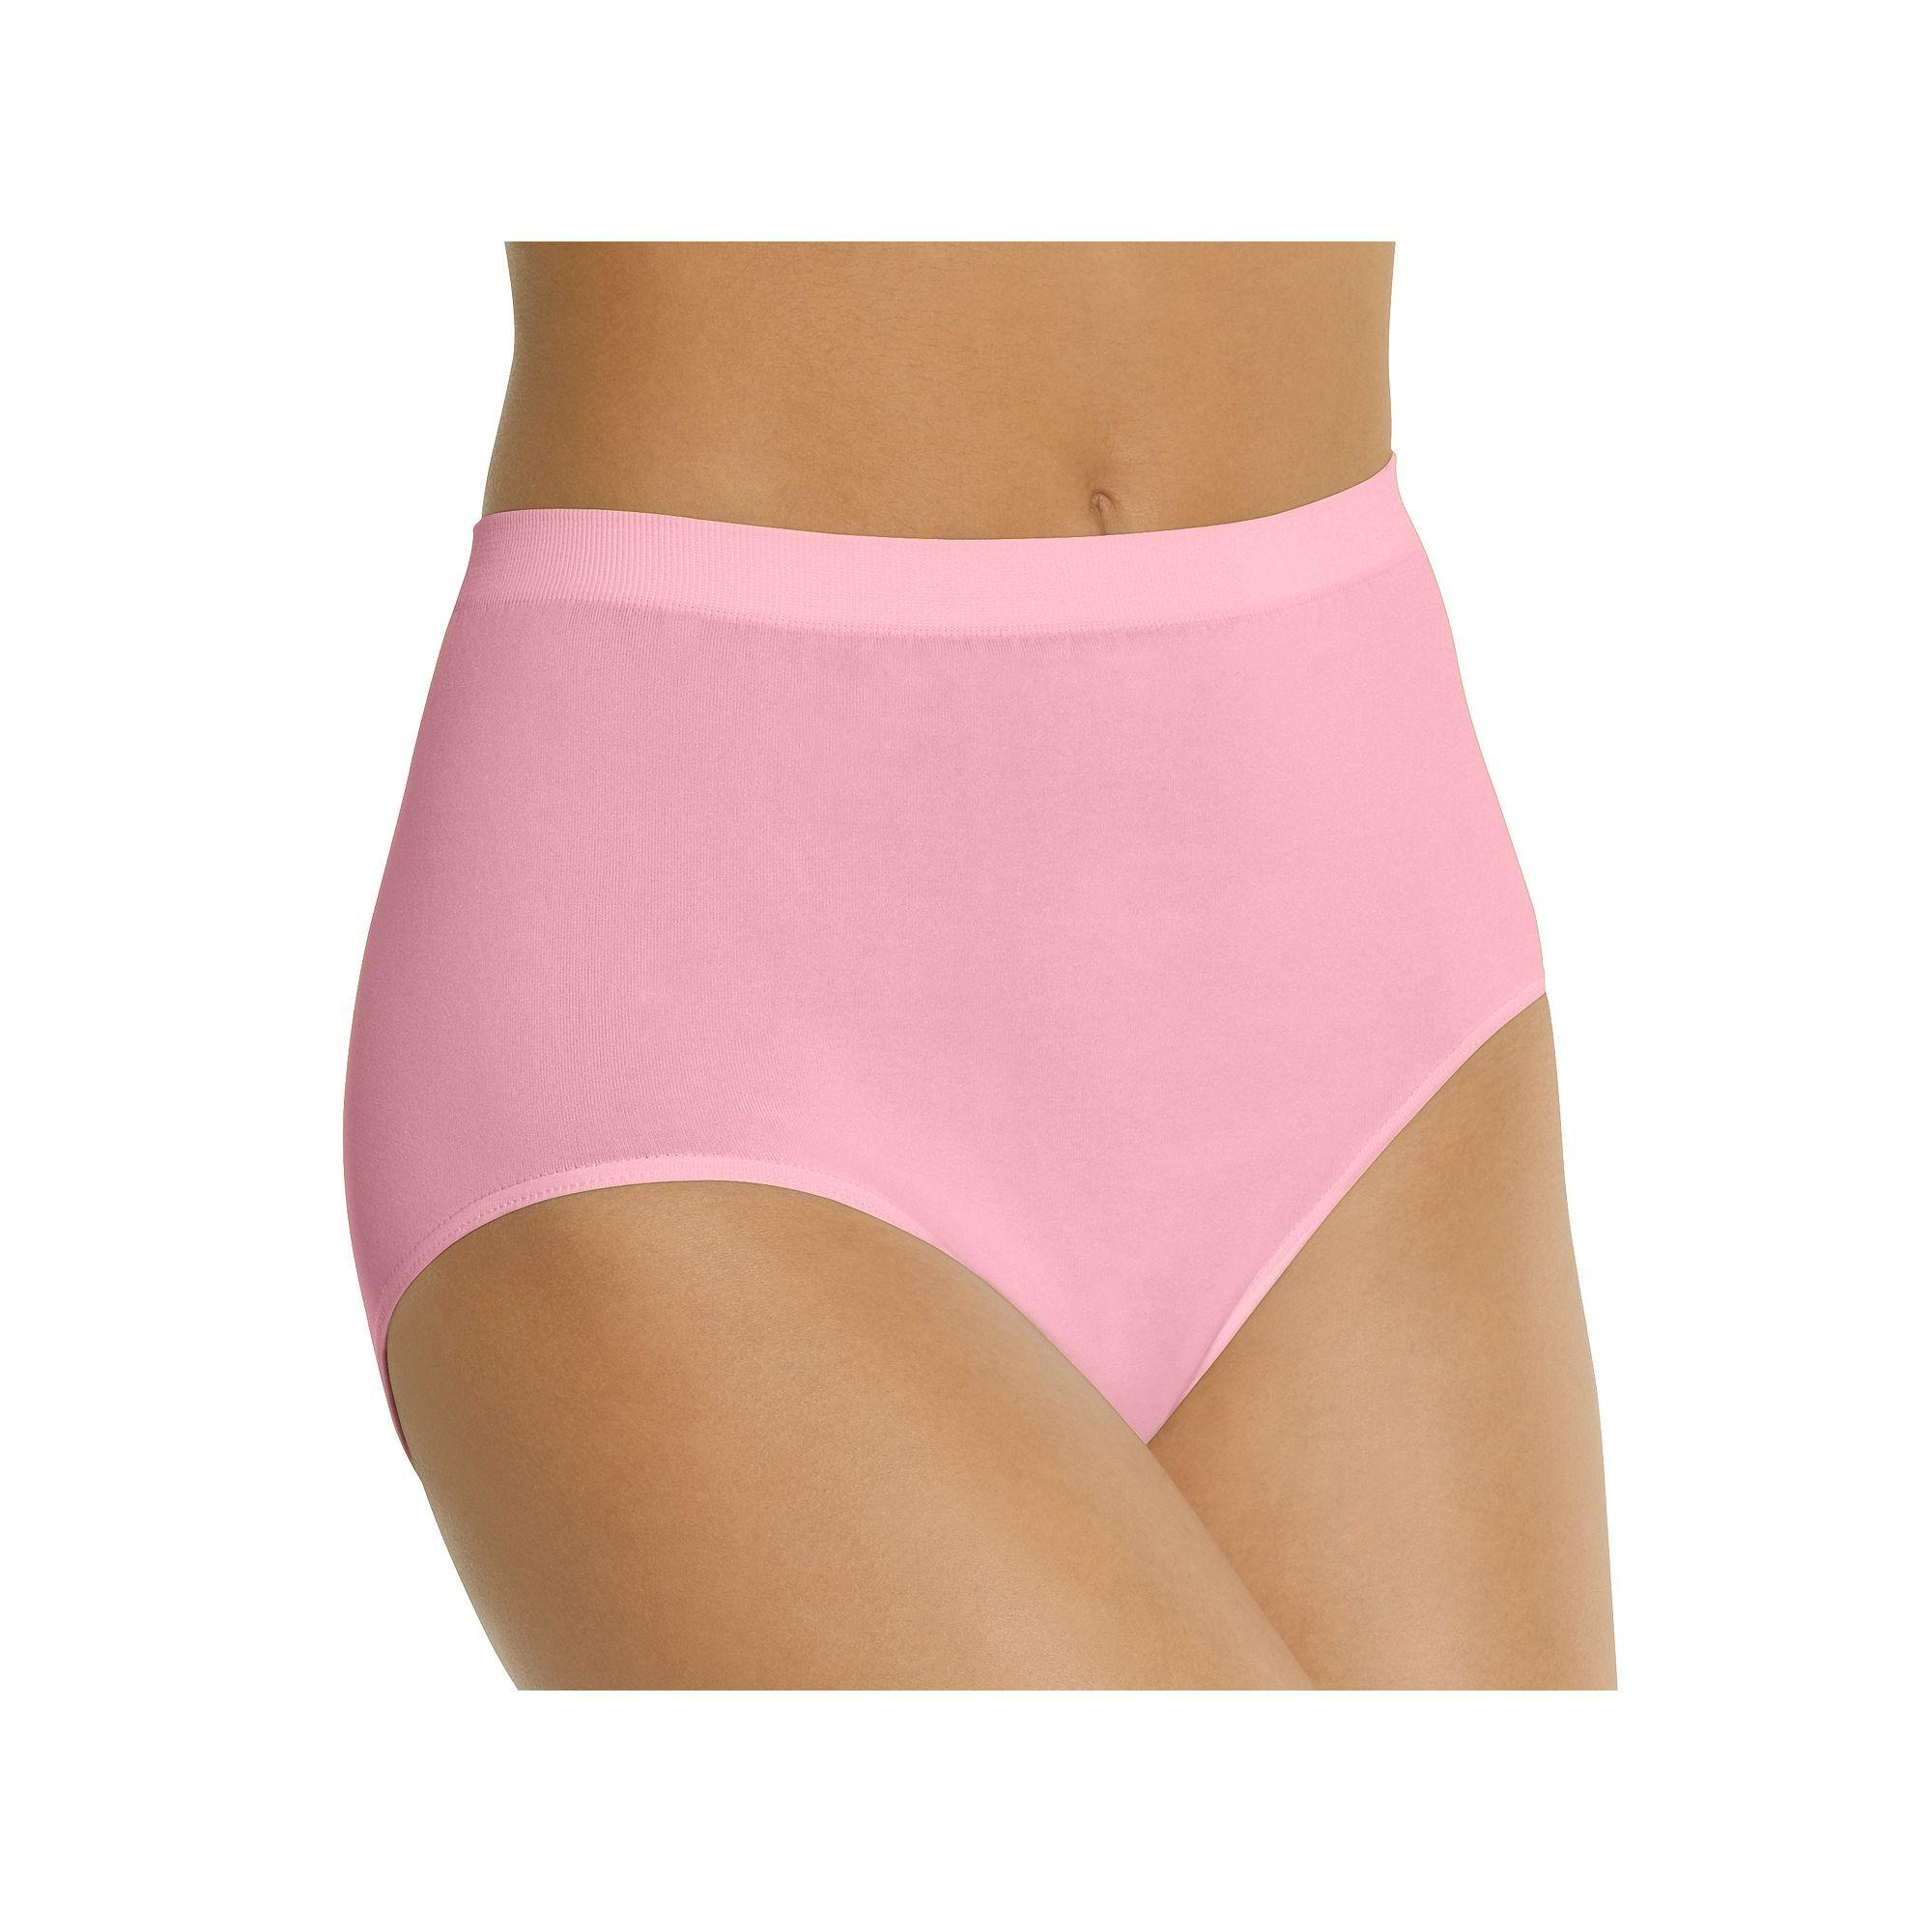 Bali Comfort Revolution Seamless Microfiber Brief 803J - Women's, Size: 7, Pink